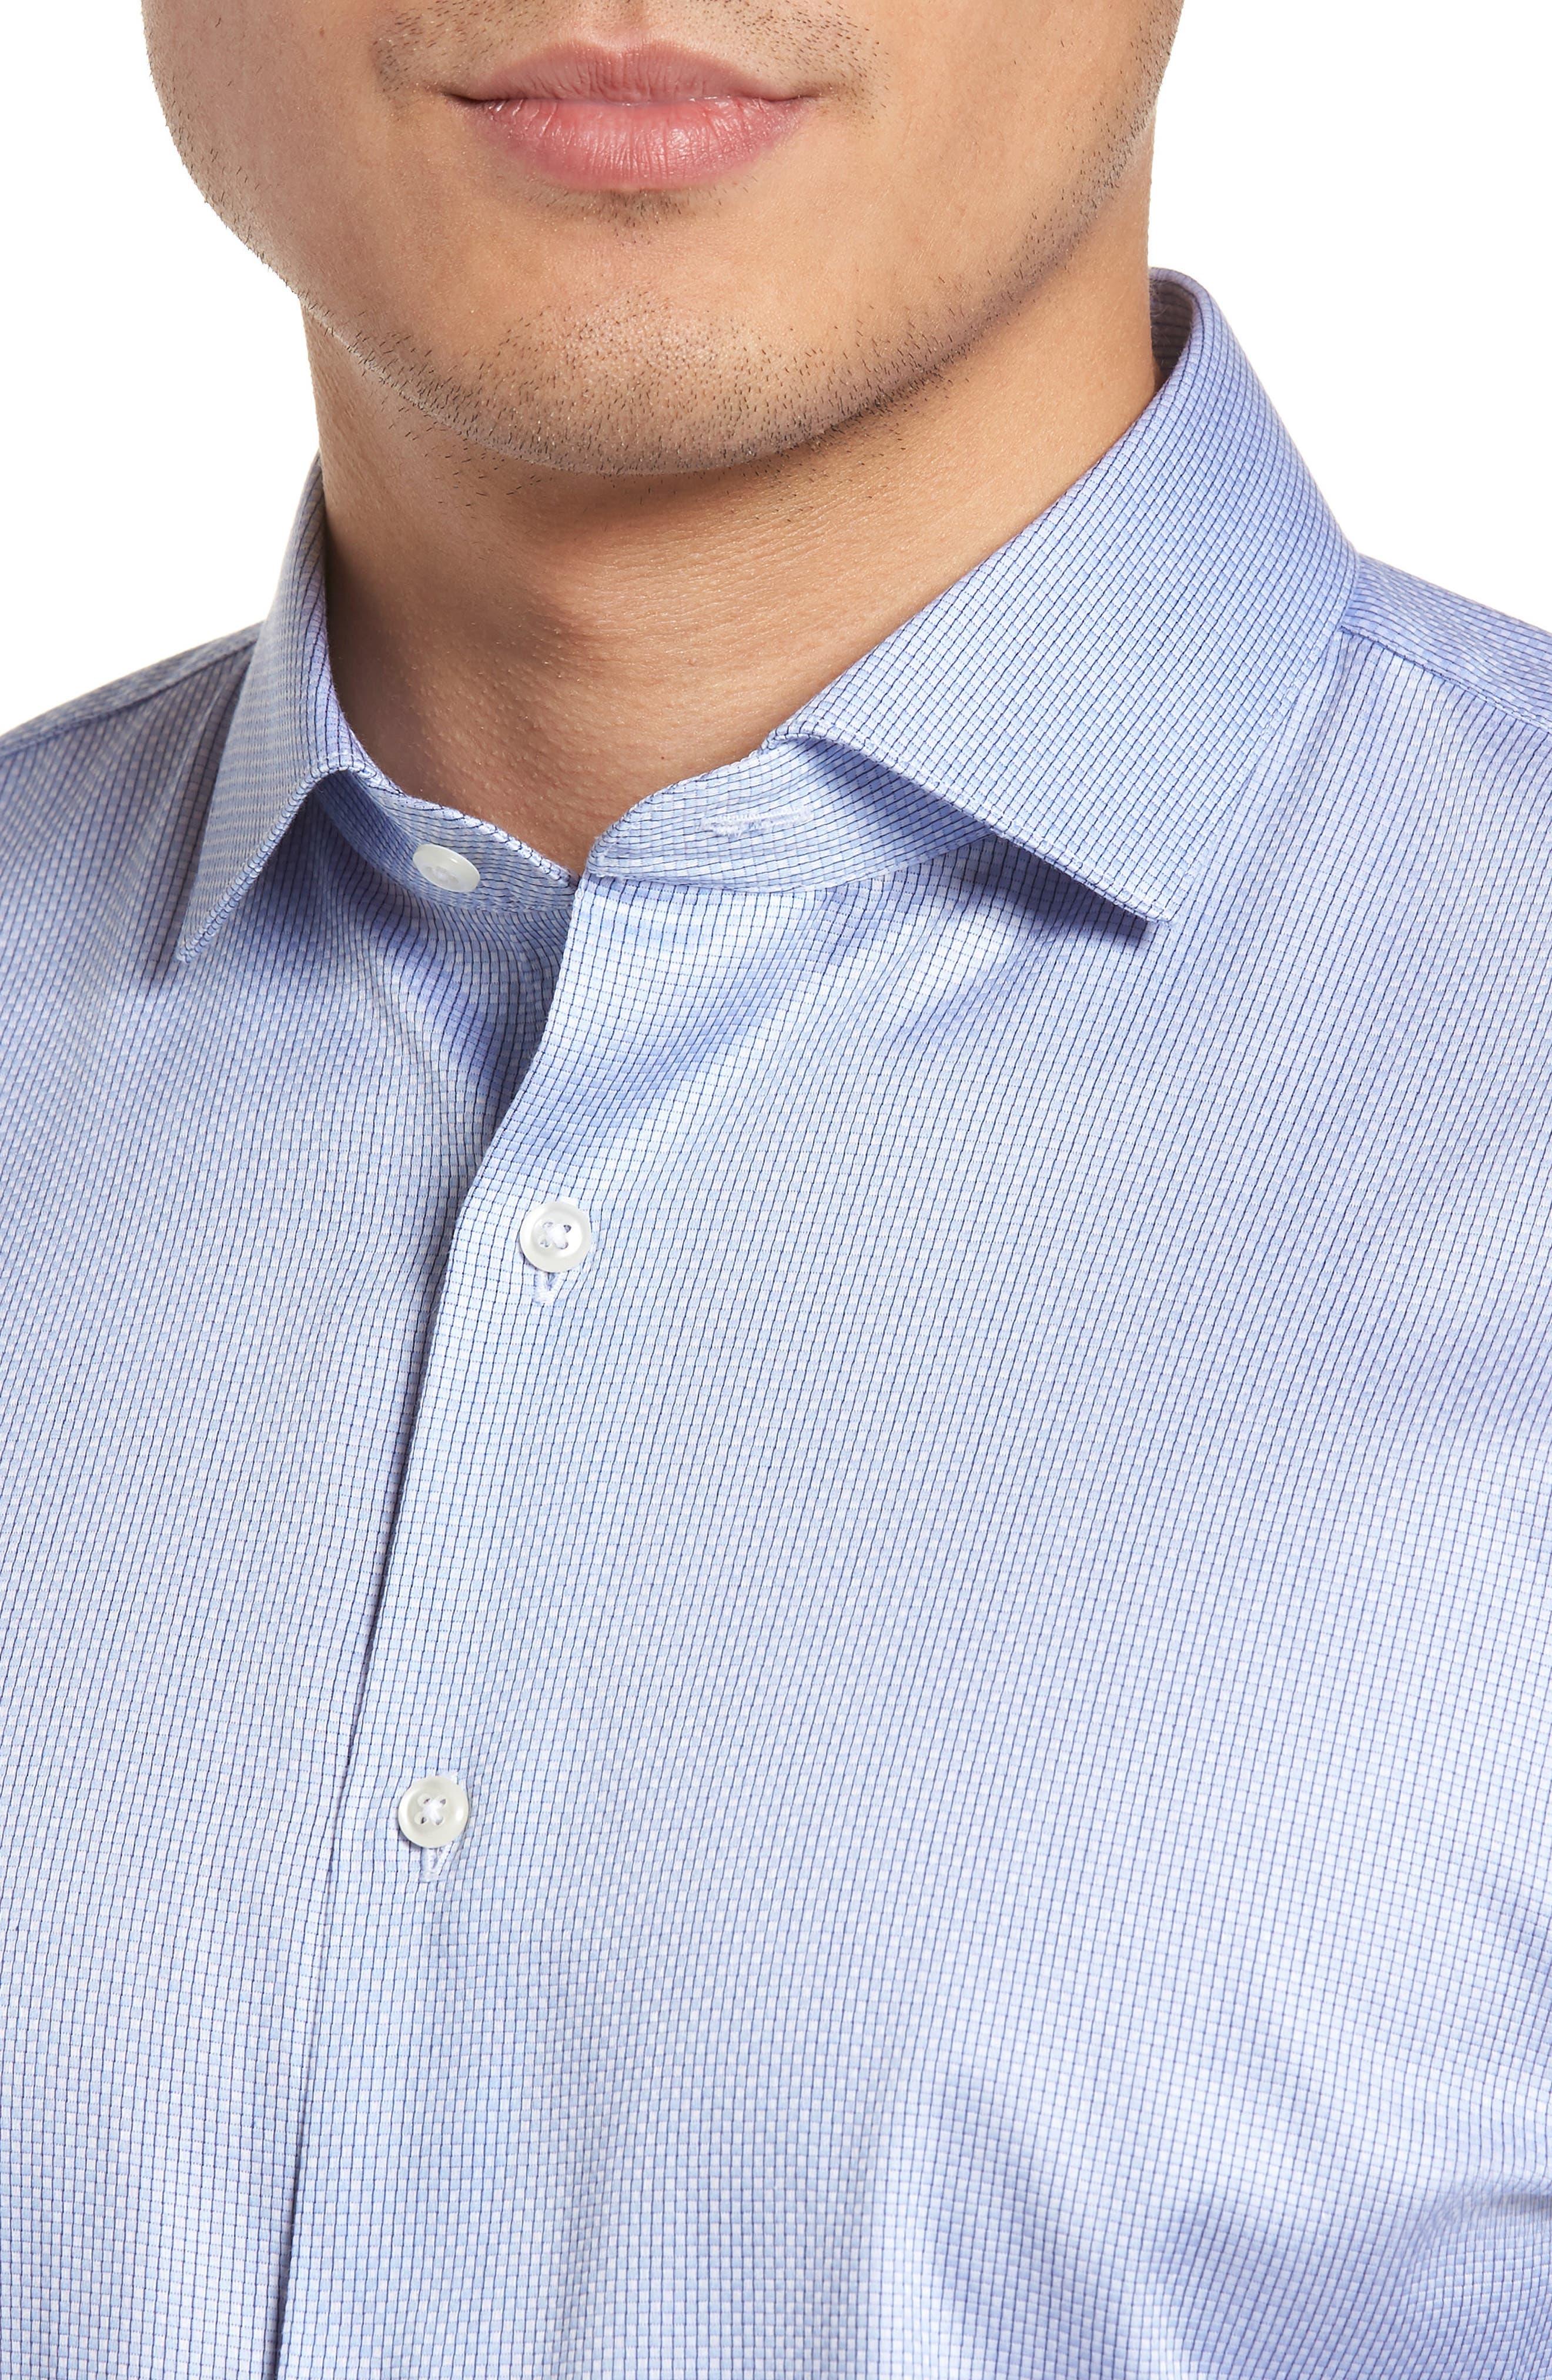 Trim Fit Stripe Dress Shirt,                             Alternate thumbnail 5, color,